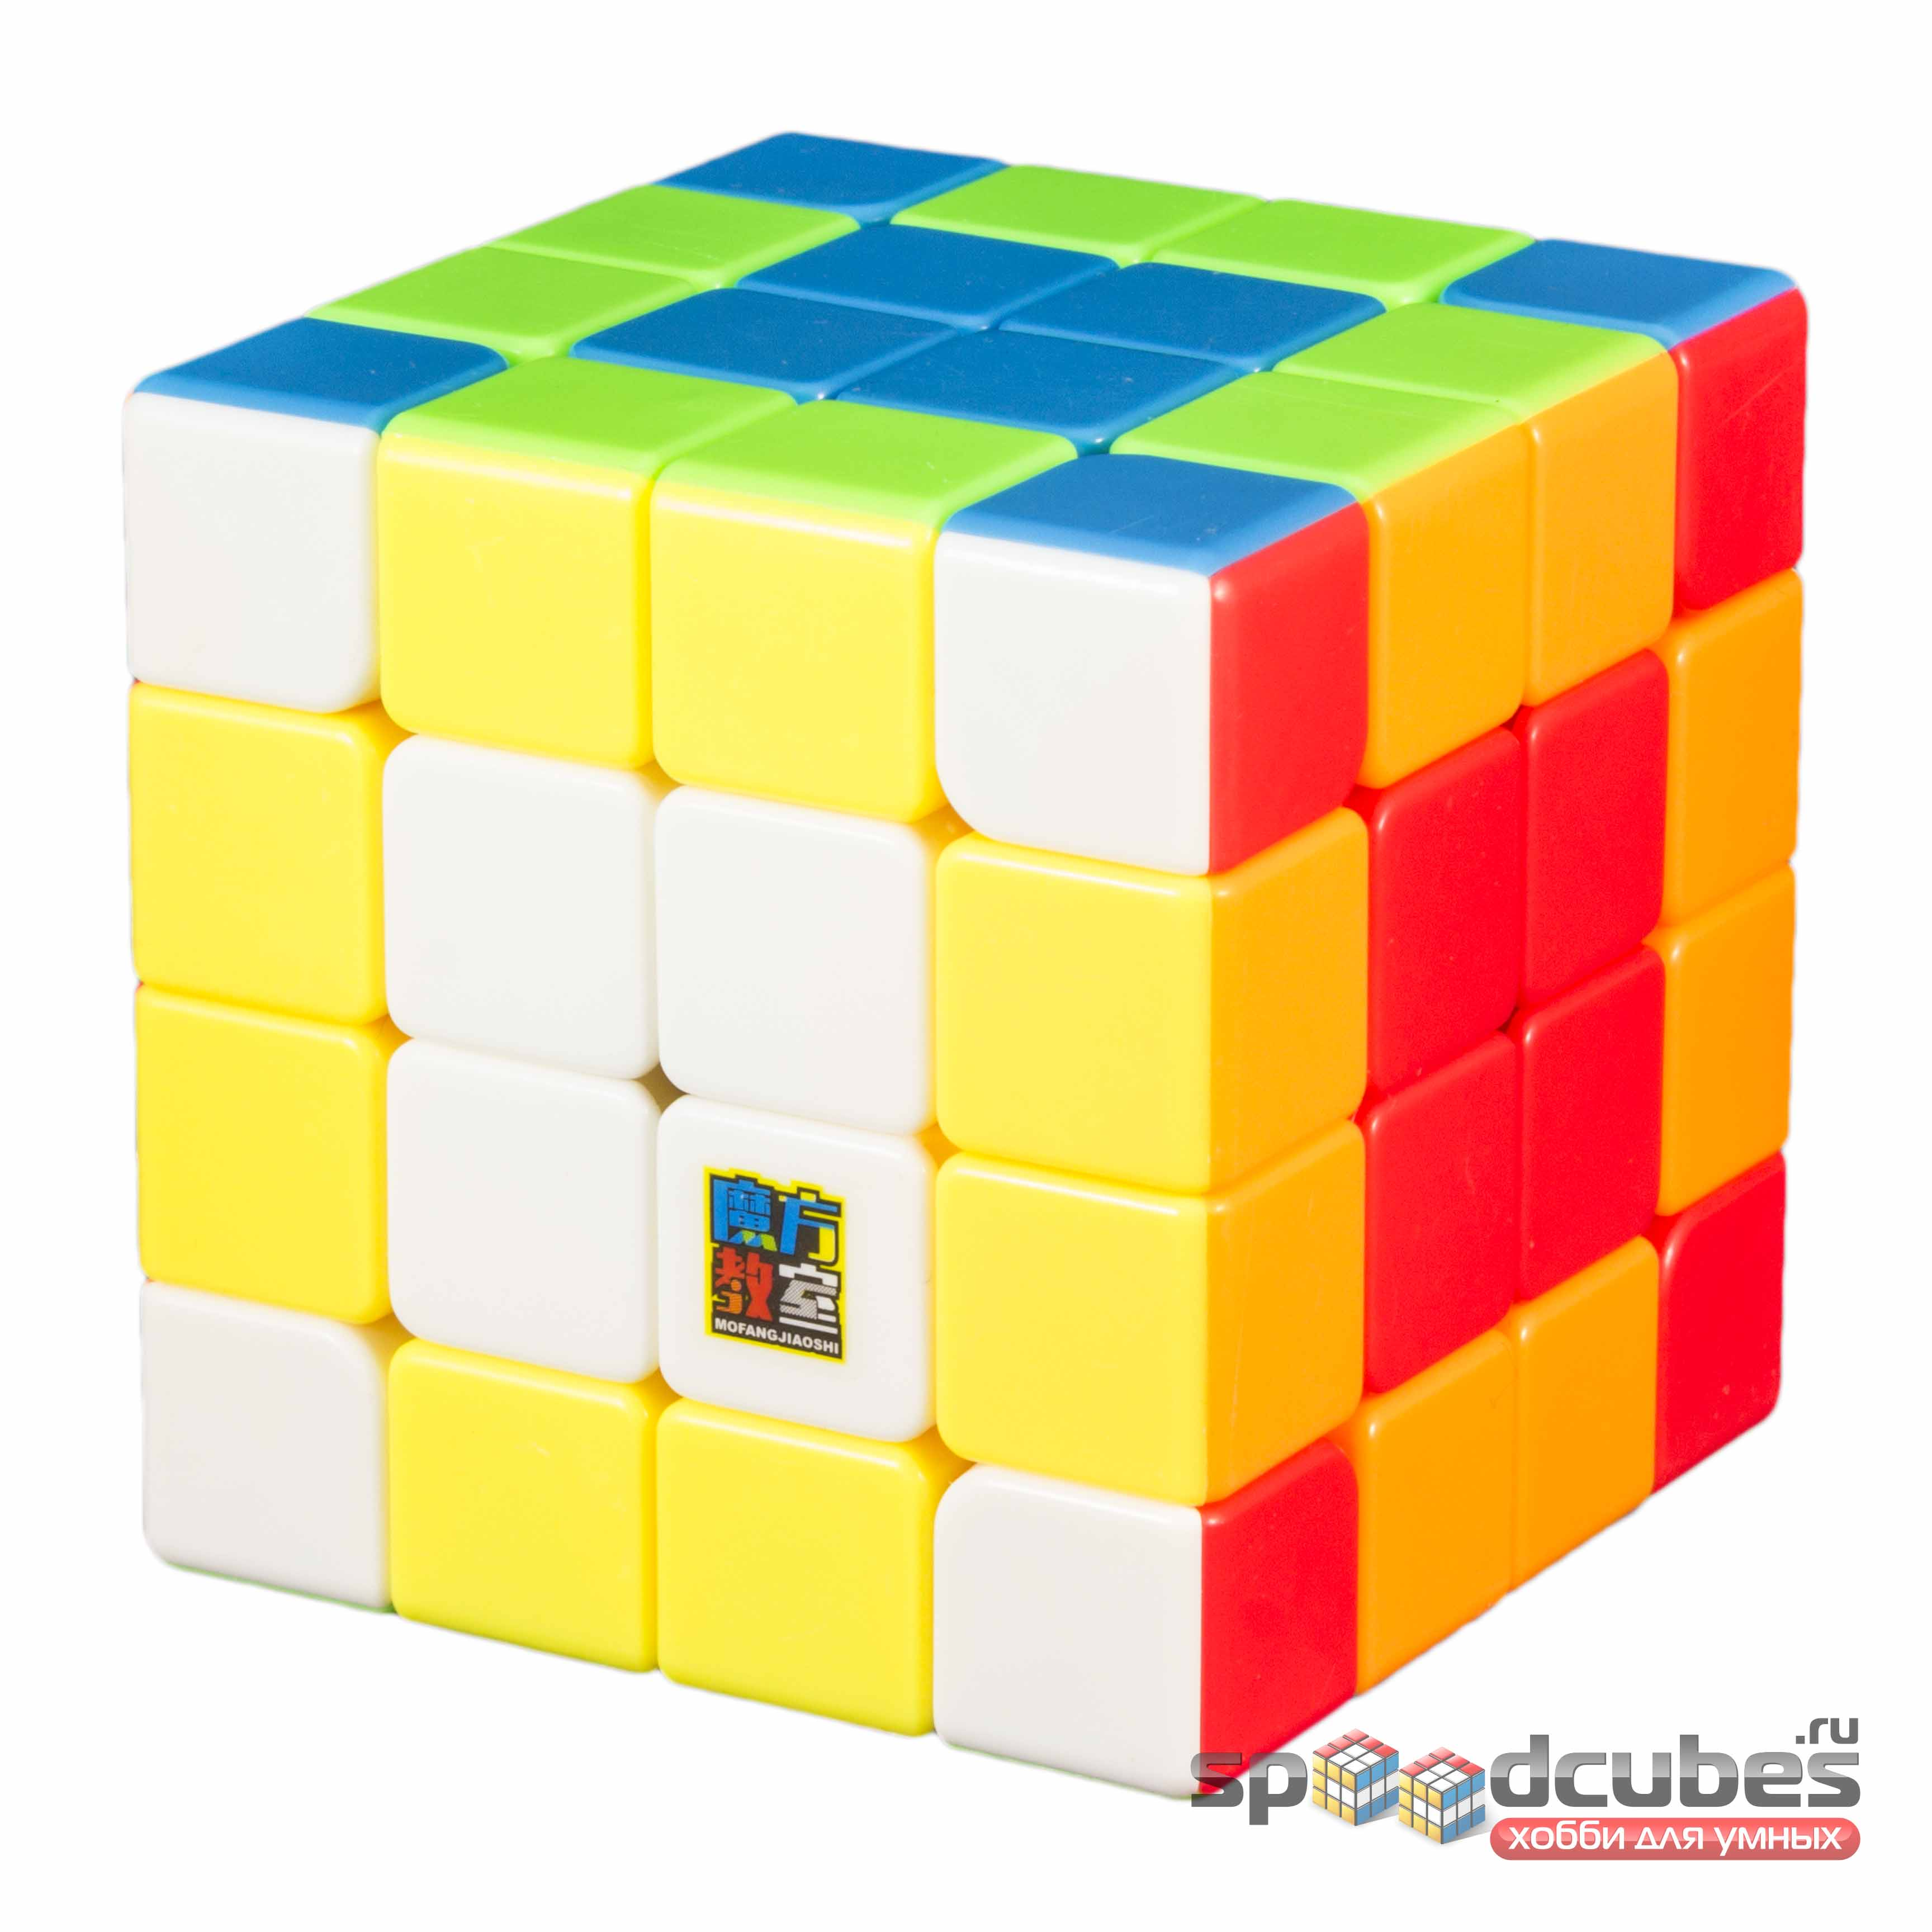 MoYu Cubing Classroom (набор Moyu MF2s, MF3rs, MF4s, MF5s) 5